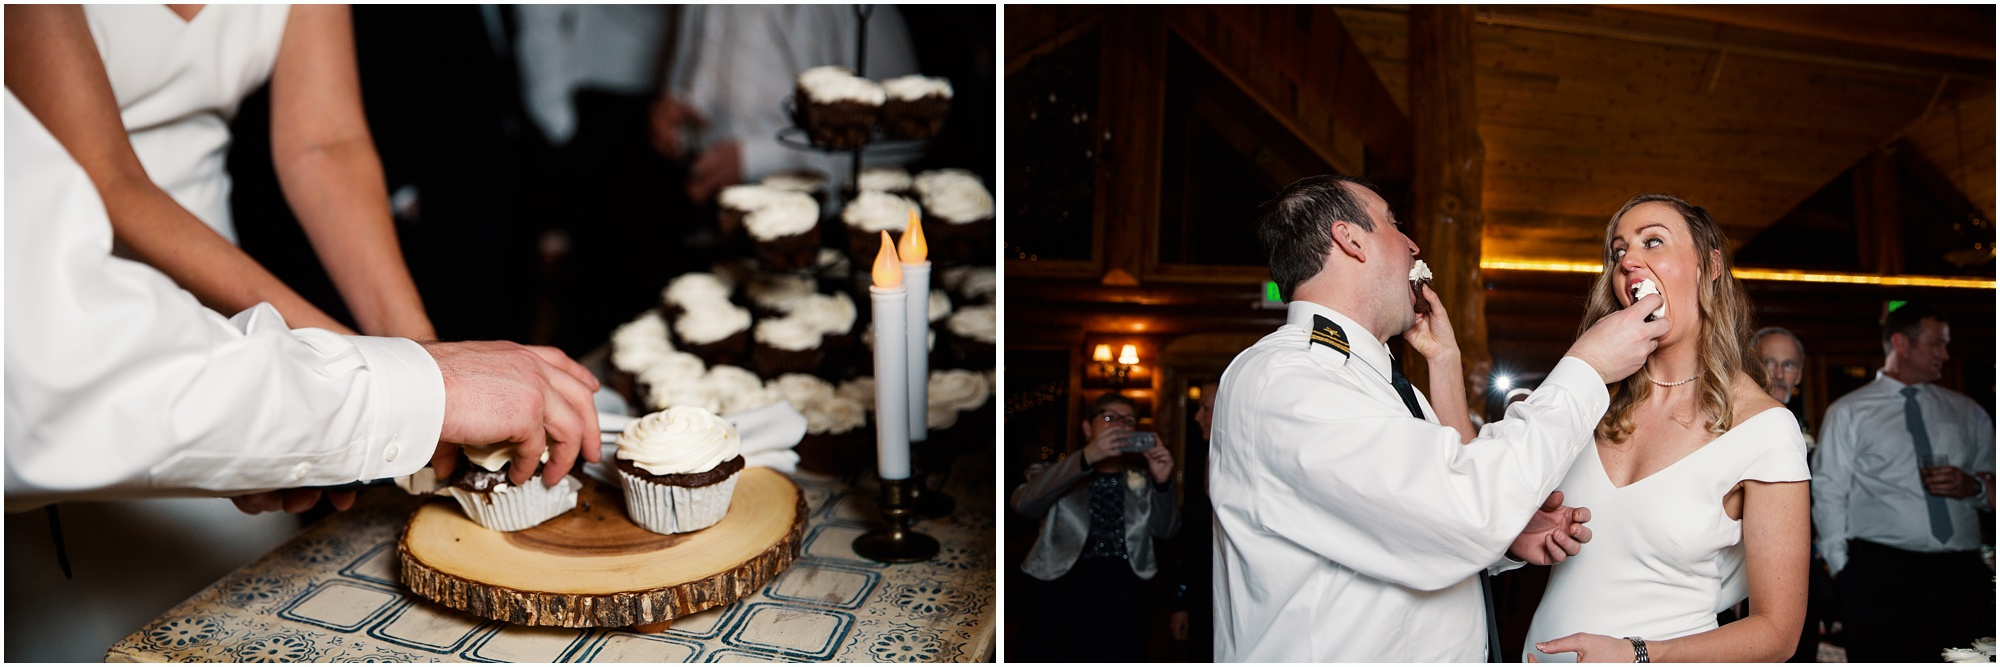 Breckenridge-Wedding-Photographer_0071.jpg